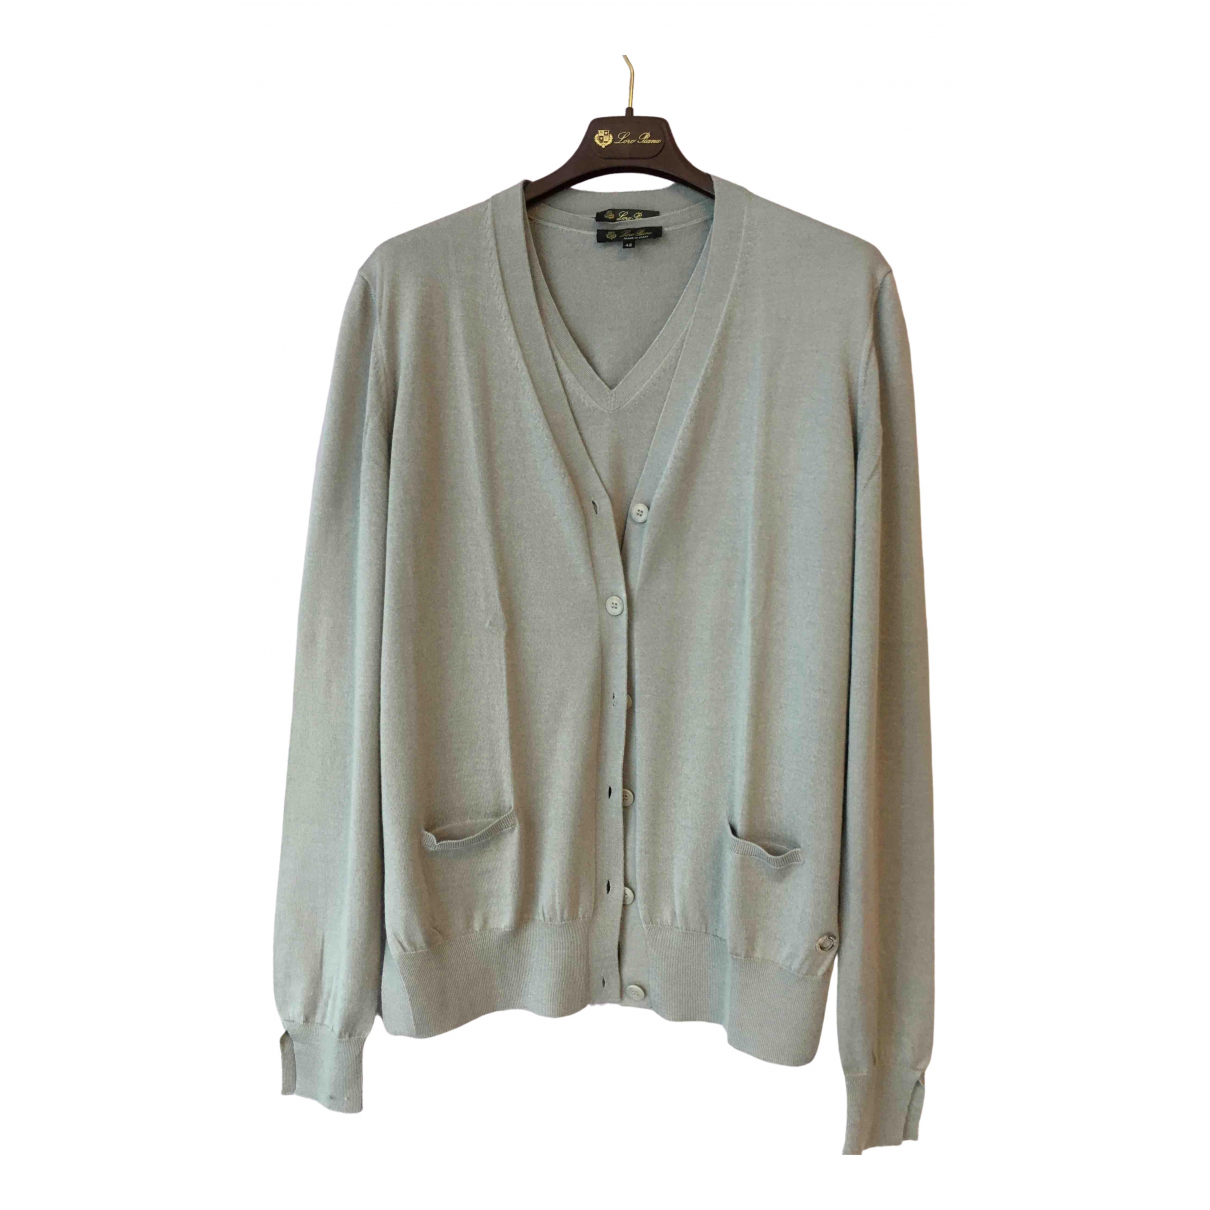 Loro Piana N Grey Cashmere Knitwear for Women 42 IT